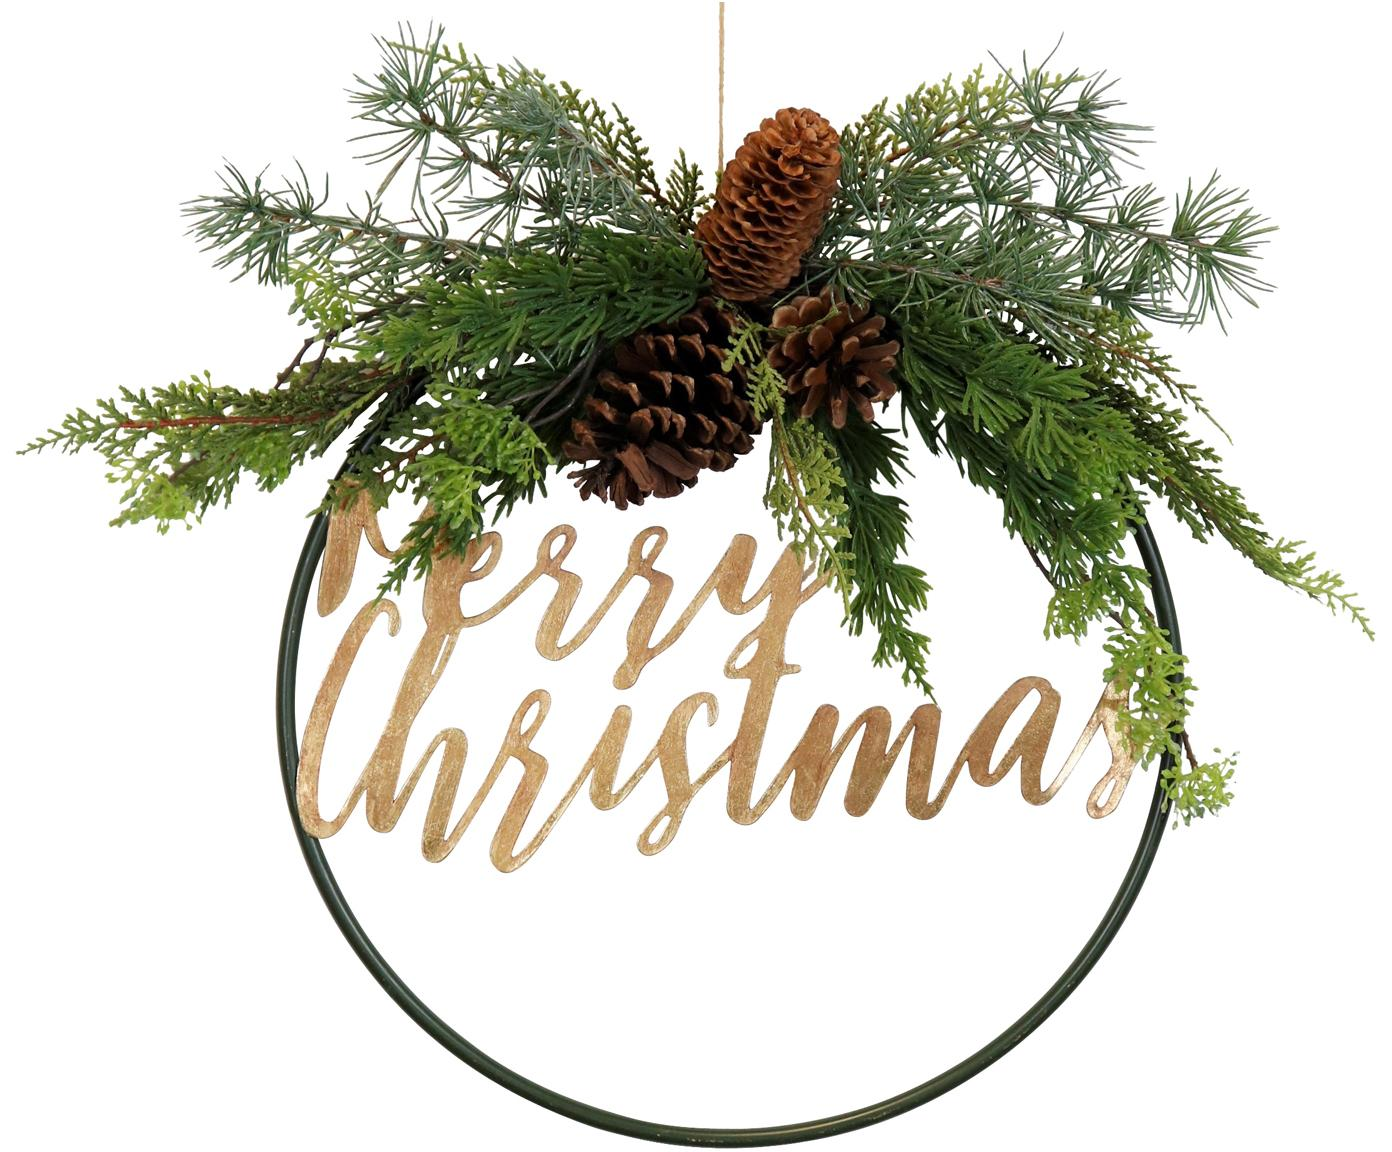 Deko-Anhänger Merry Christmas , Metall, Kunststoff, Zapfen, Grün, Braun, Ø 36 cm